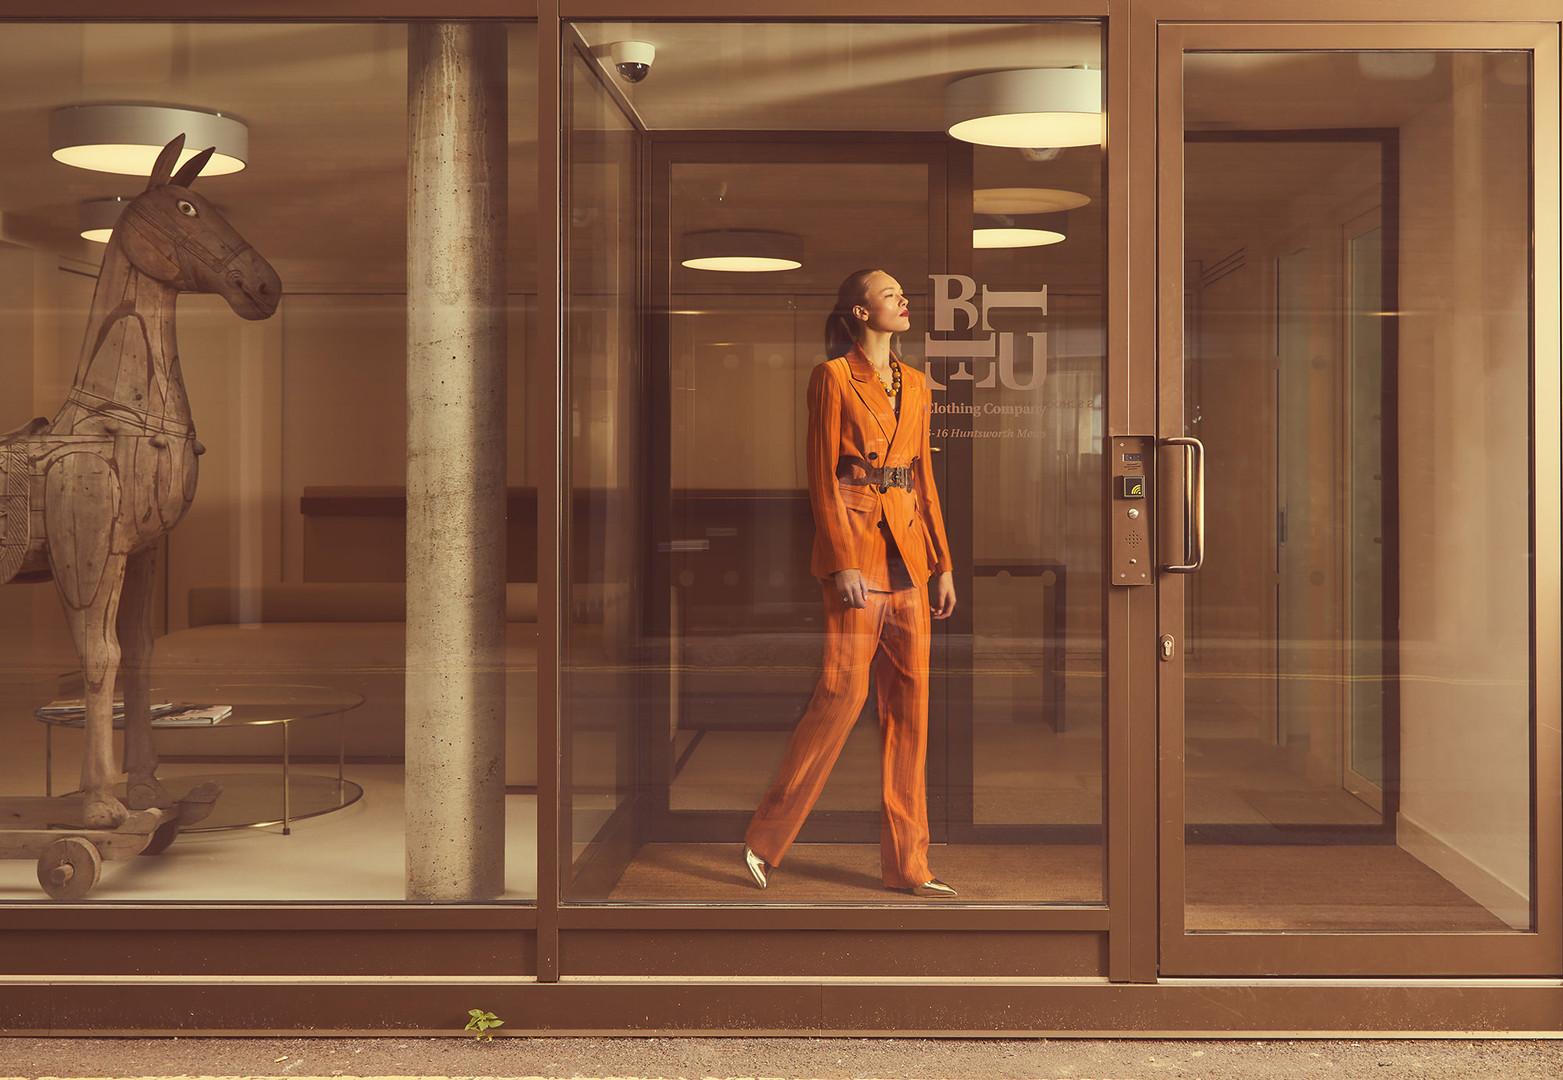 blue clothing uk campaign | Liron Weissman | Rachael Thomas | Profile Models | לירון ויסמן | London fashion photographer